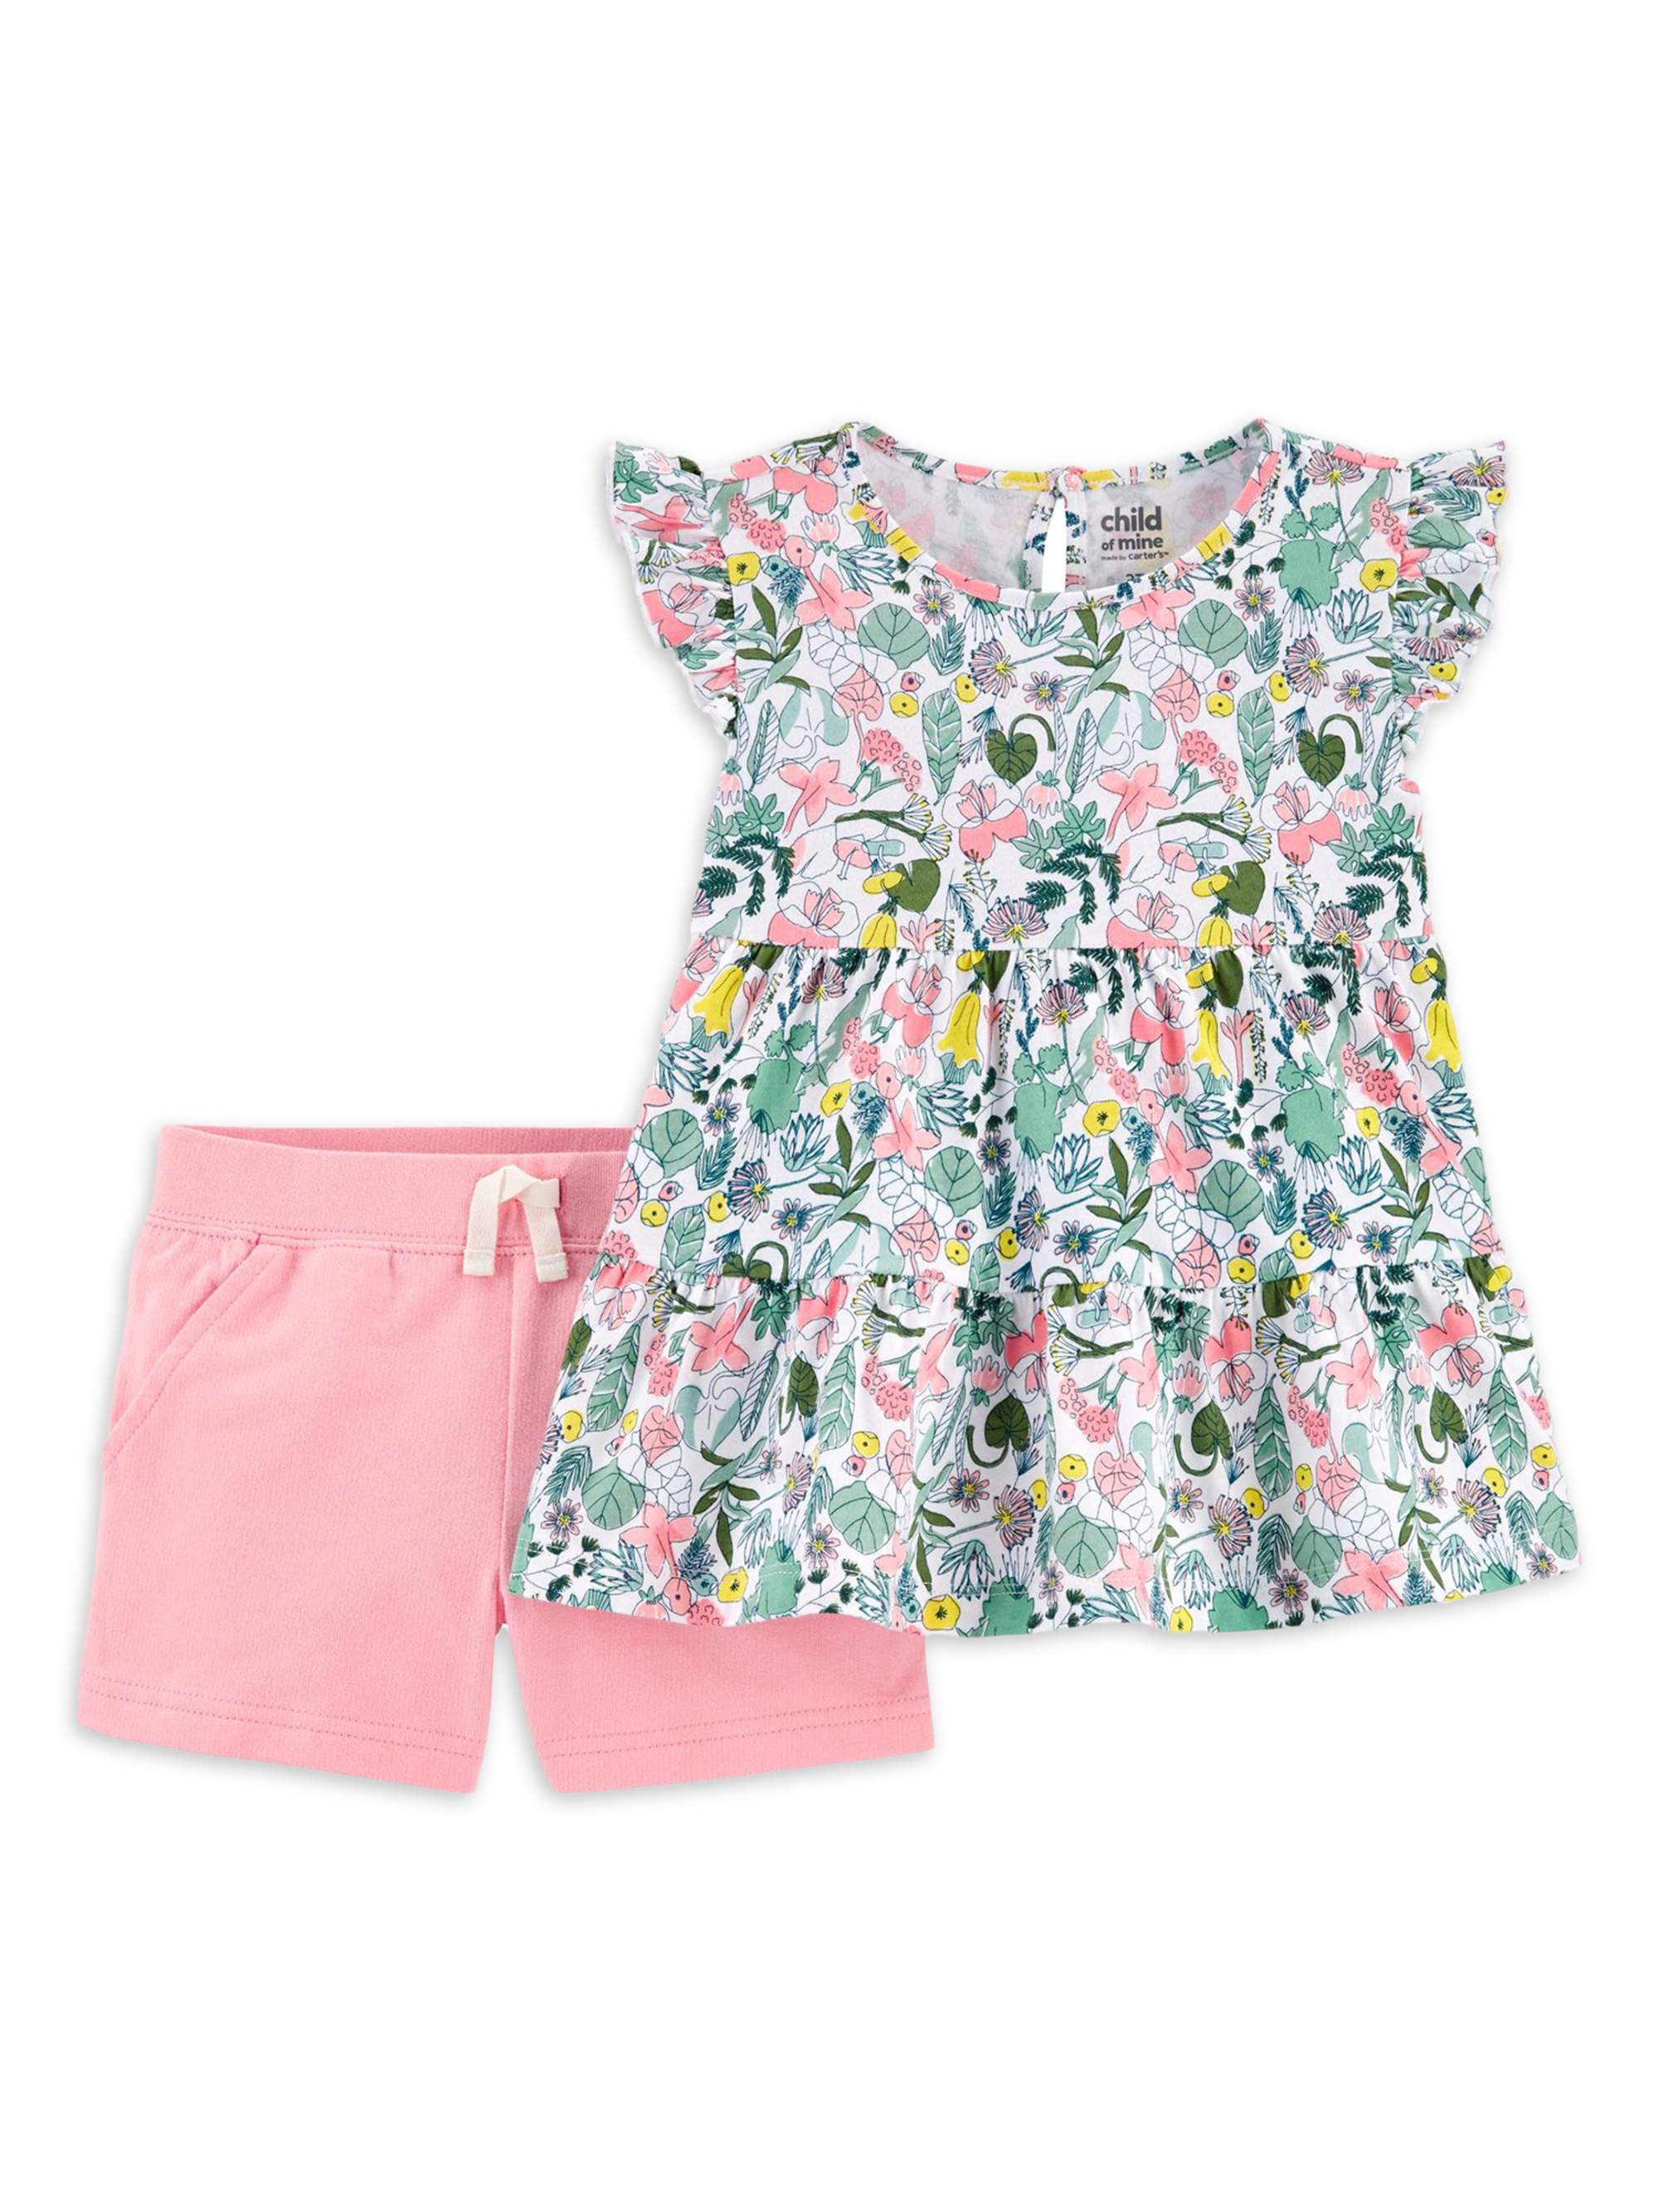 Owl Landscape Toddler Baby Girls Short Sleeve Ruffle T-Shirt